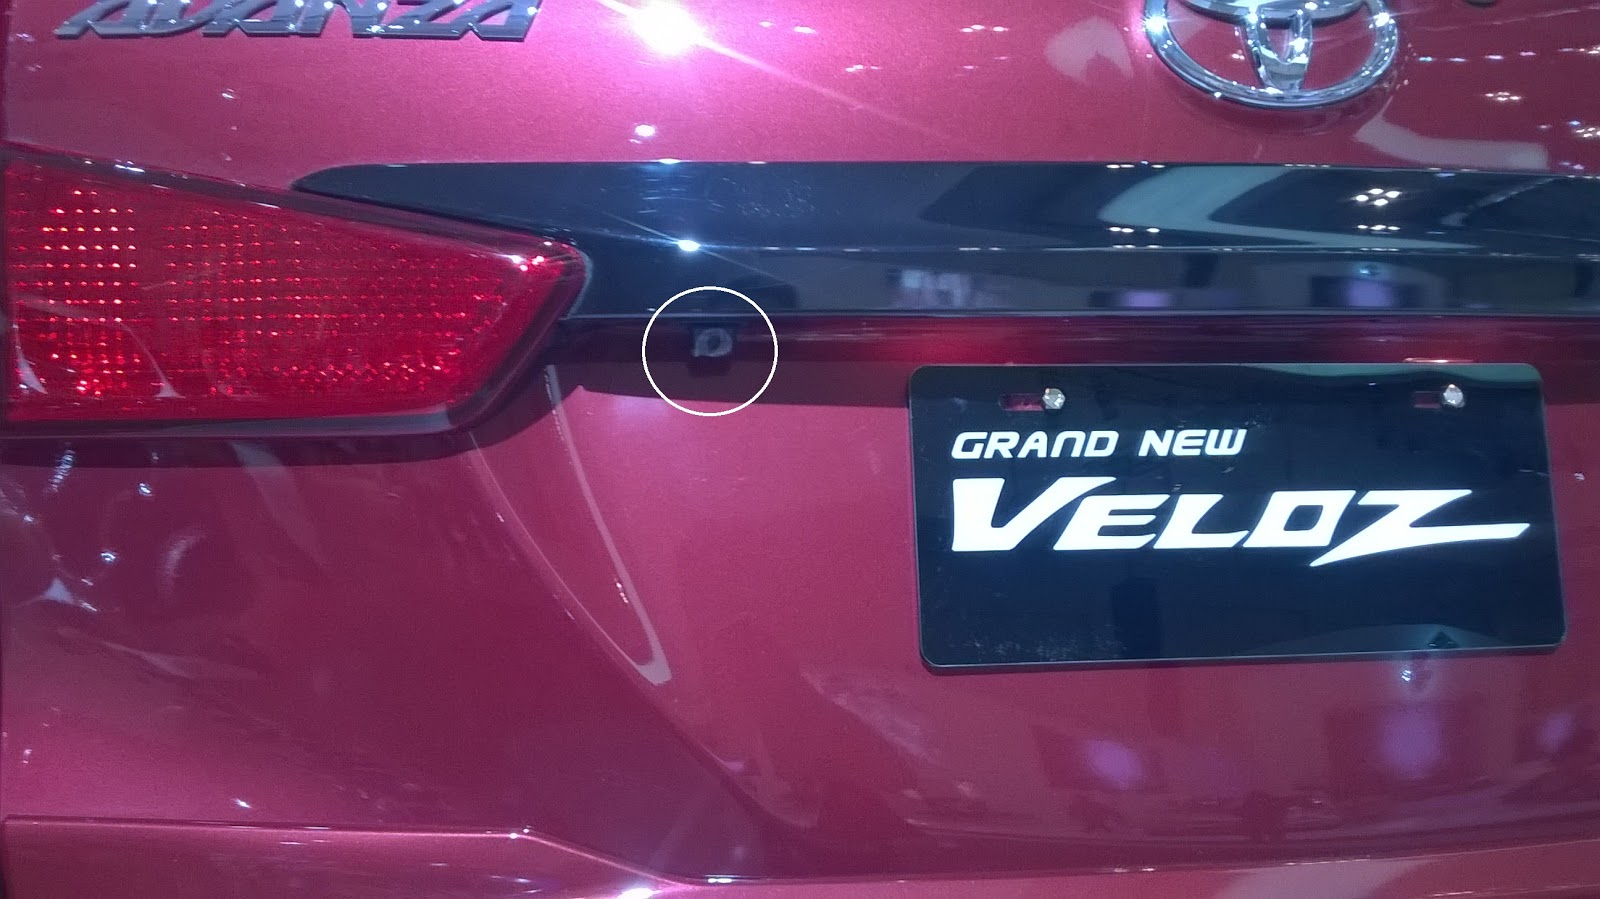 kamera parkir grand new veloz toyota all alphard 2015 cara cerdas memilih mobil keluarga didno76 com belakang pada